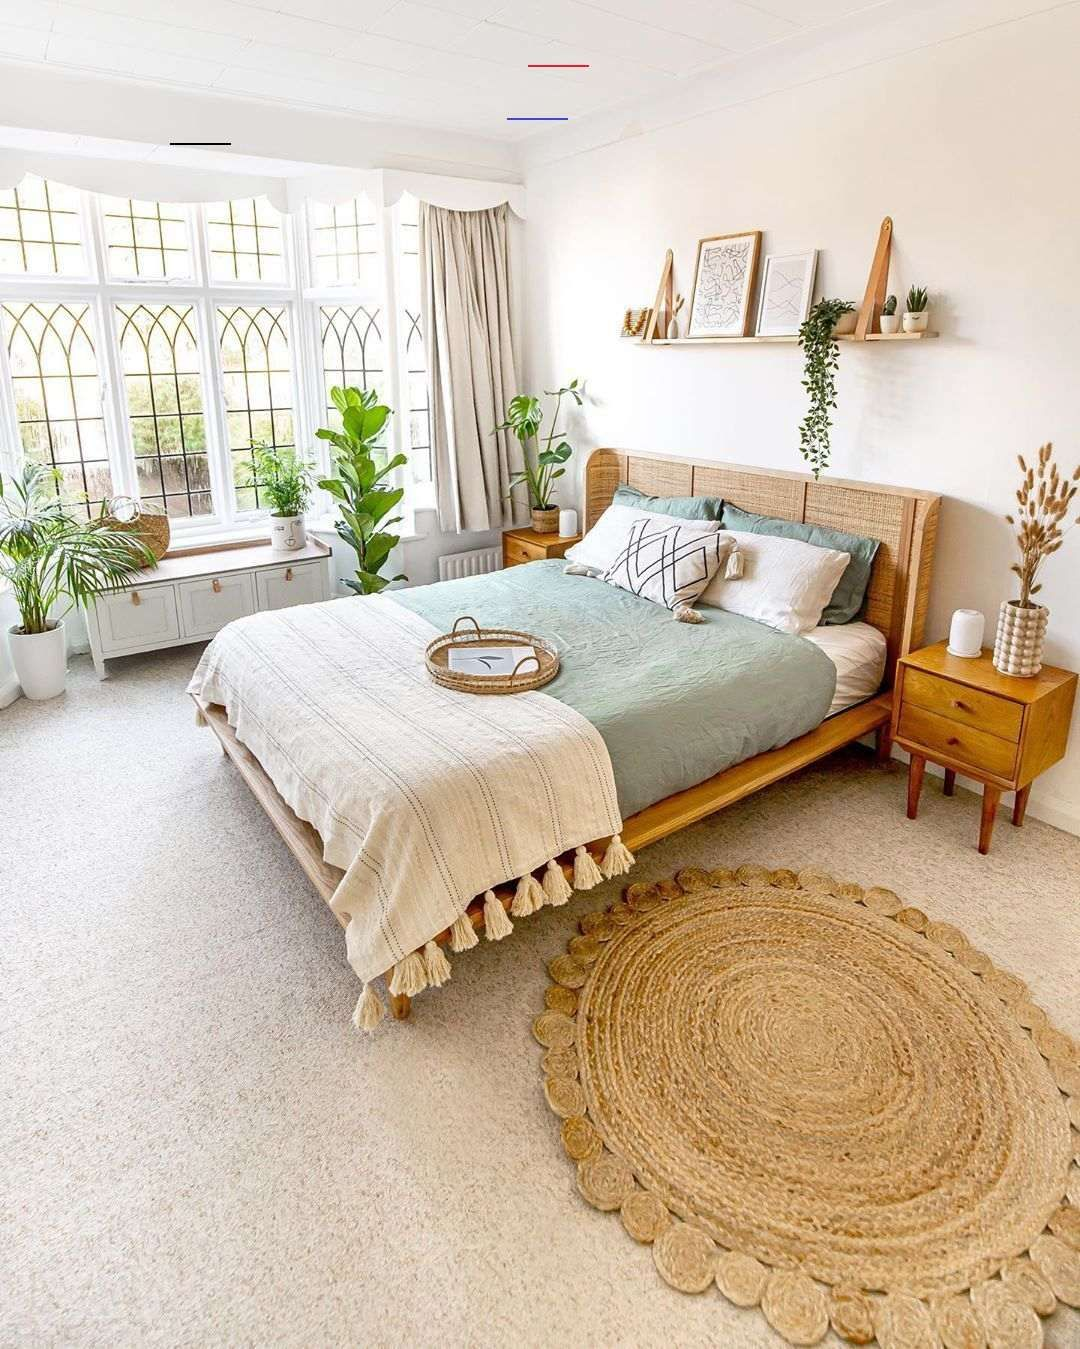 decorationentrance in 26  Bedroom inspirations, Home bedroom